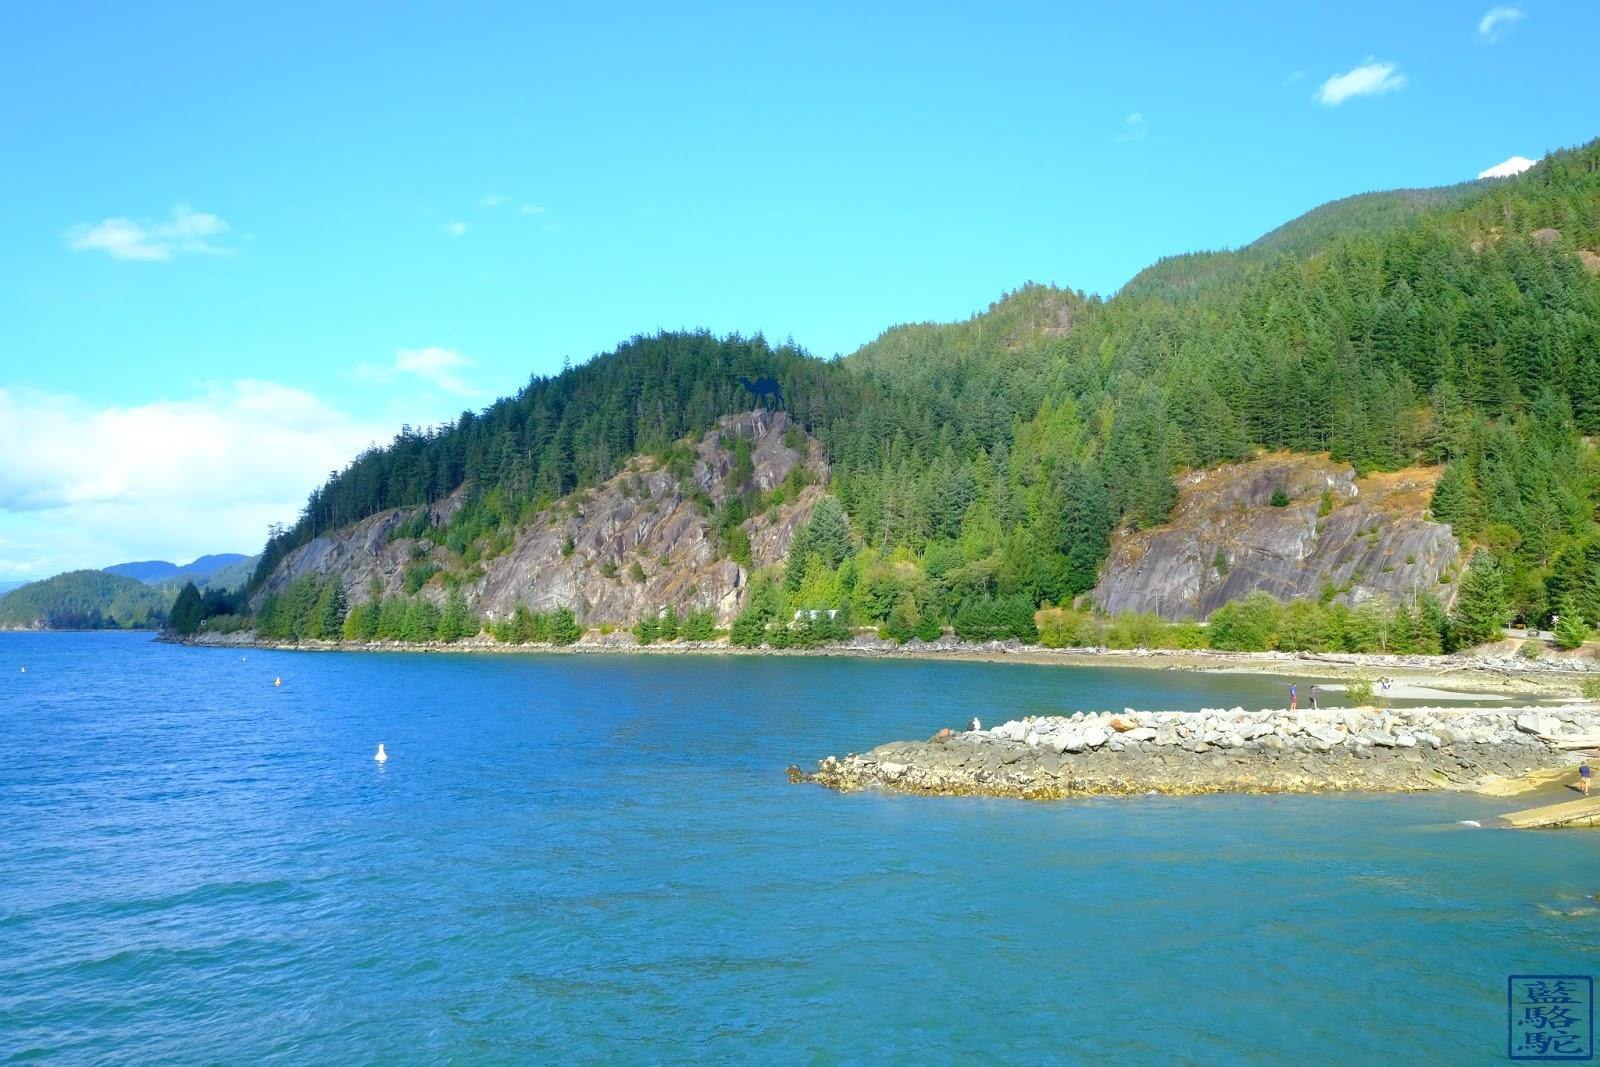 Le Chameau Bleu - Porteau Cove